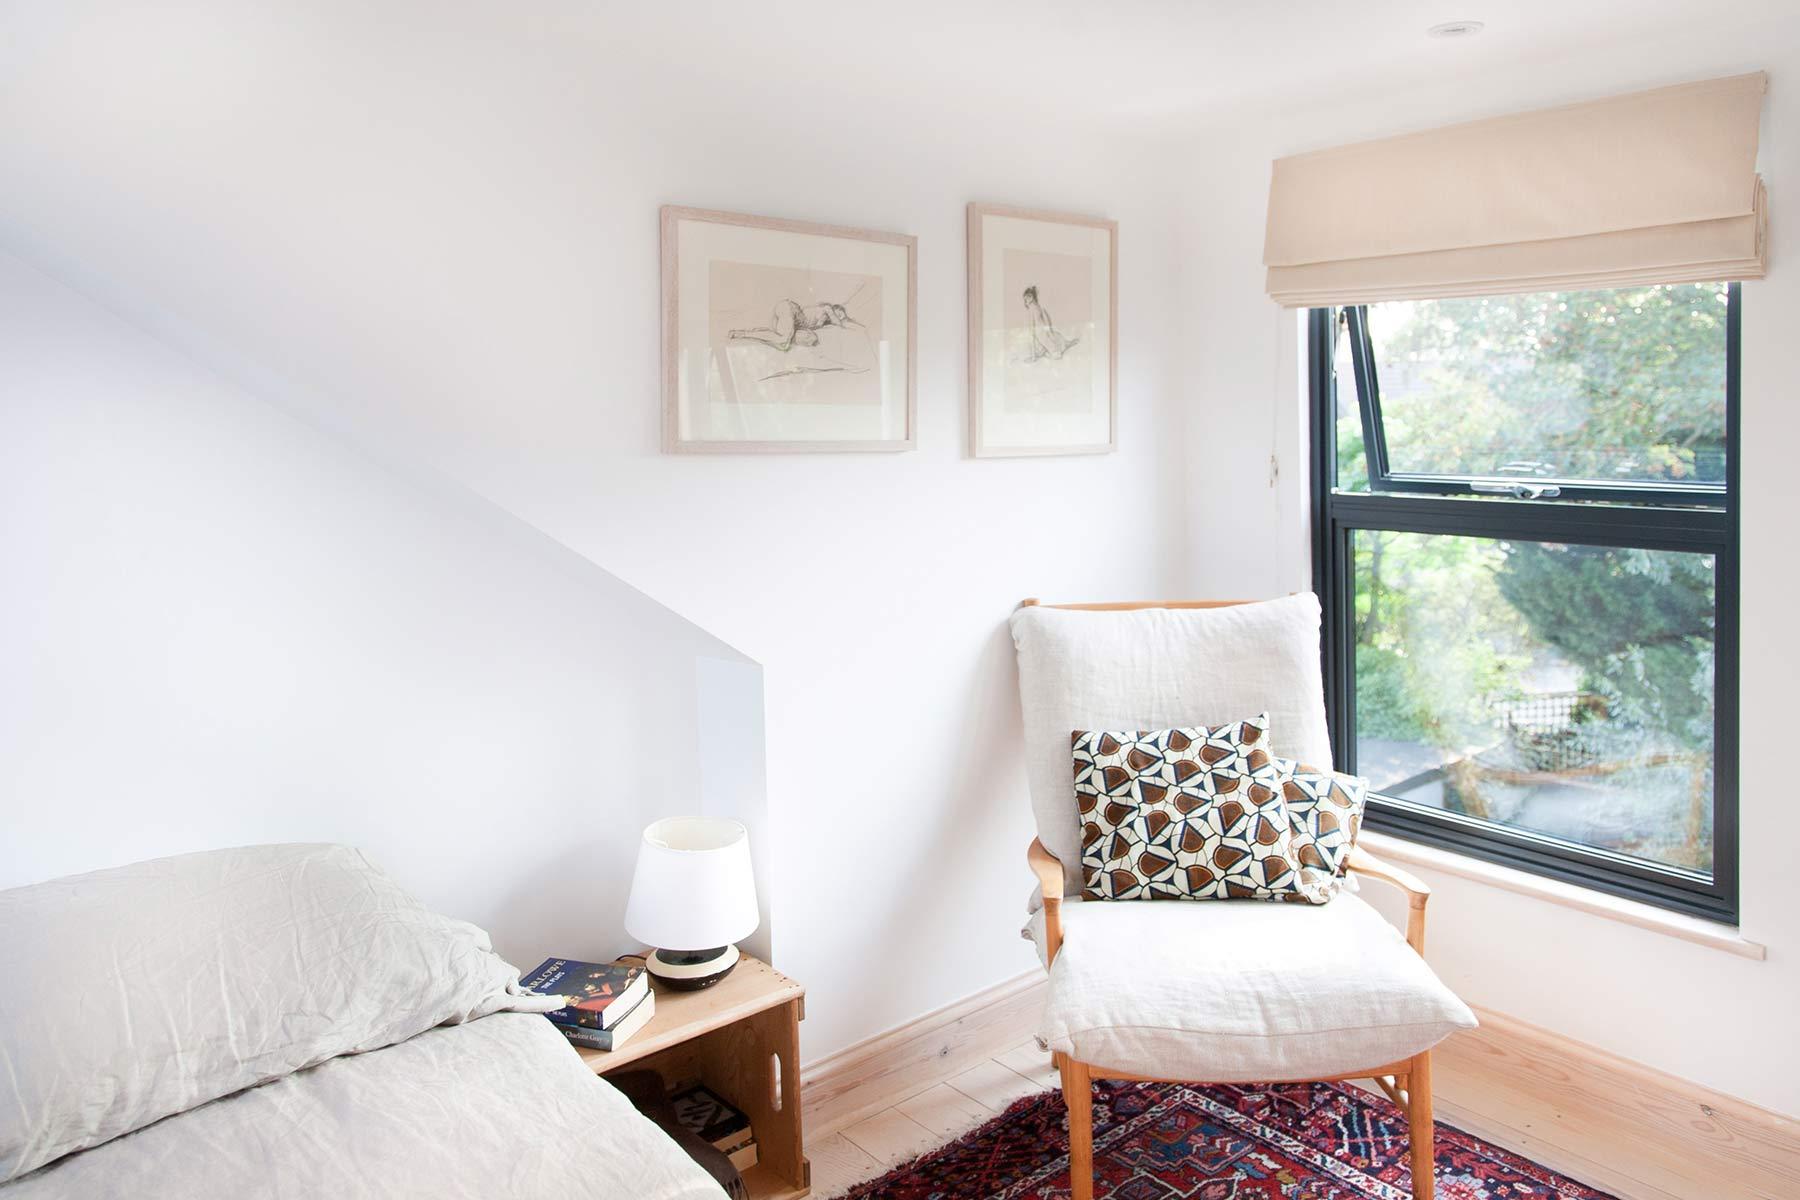 dormer loft conversion London - extending upward